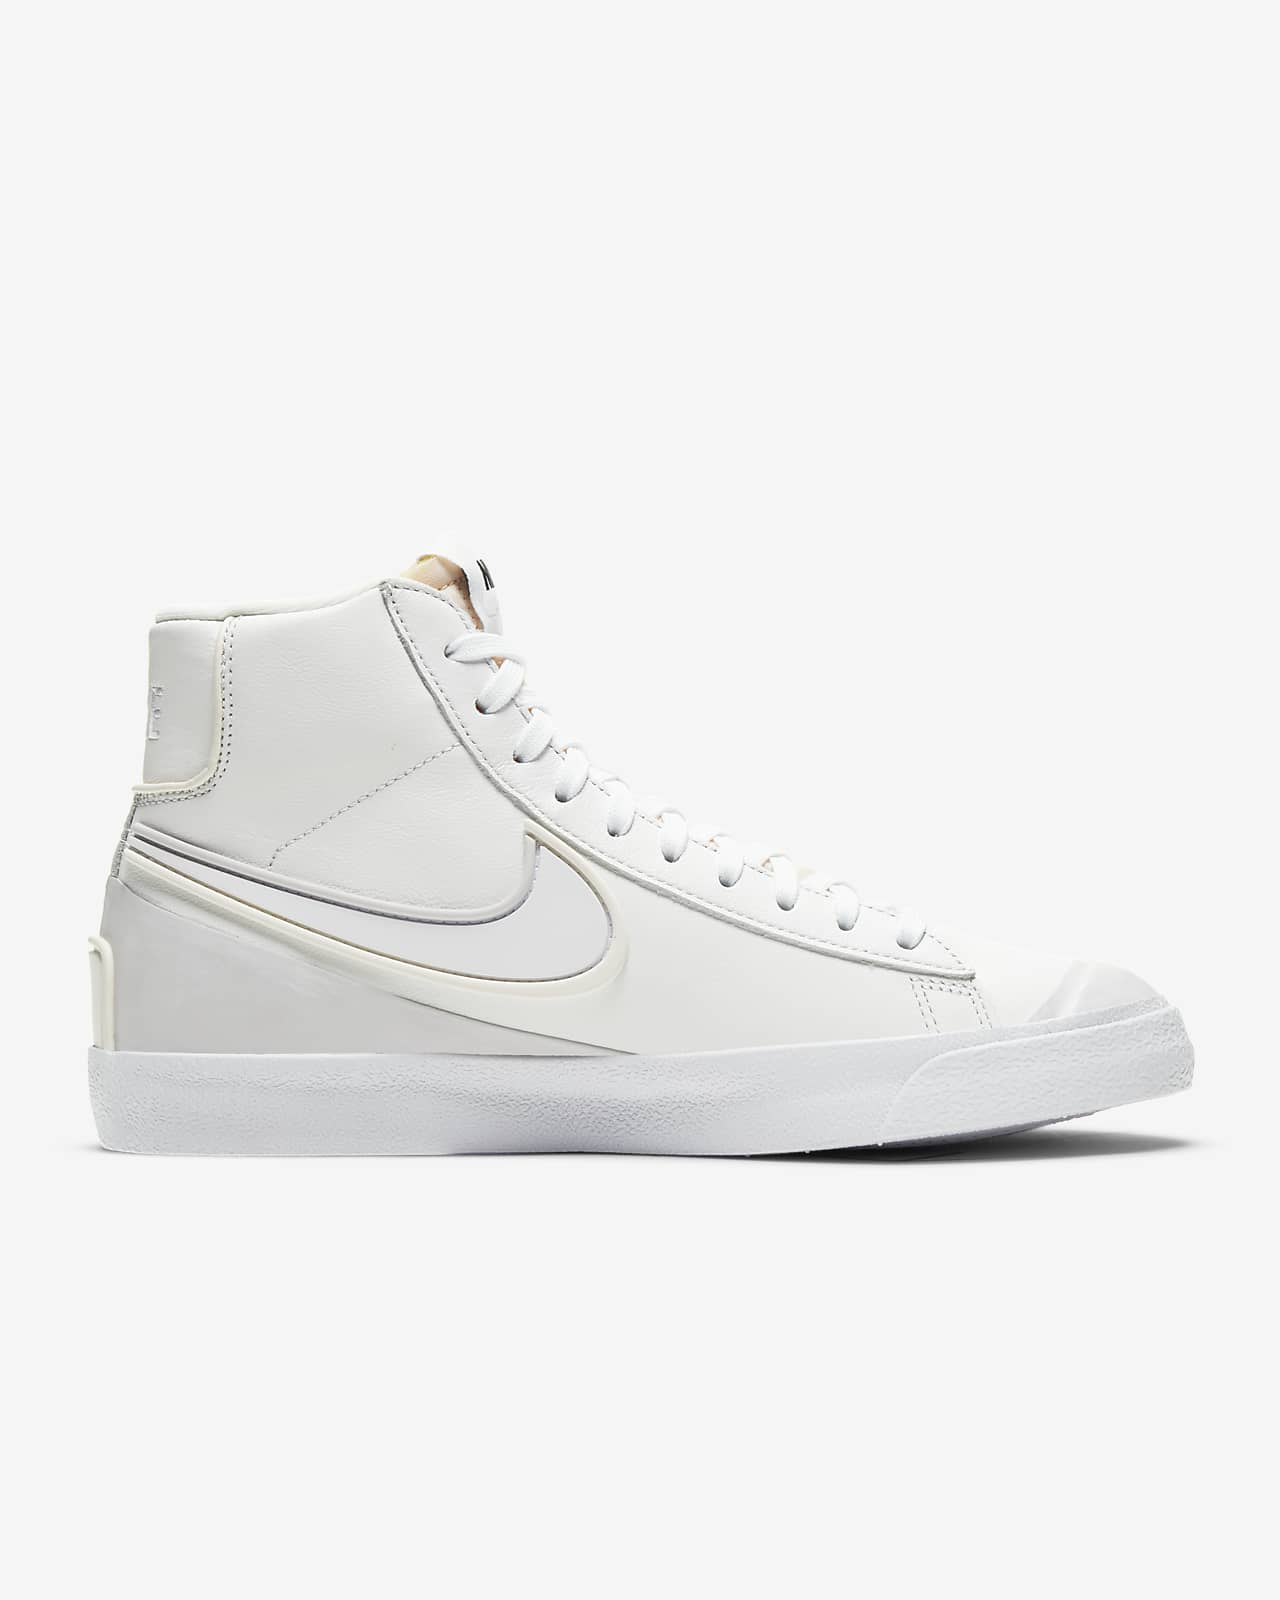 Nike Blazer Mid '77 Infinite Women's Shoe